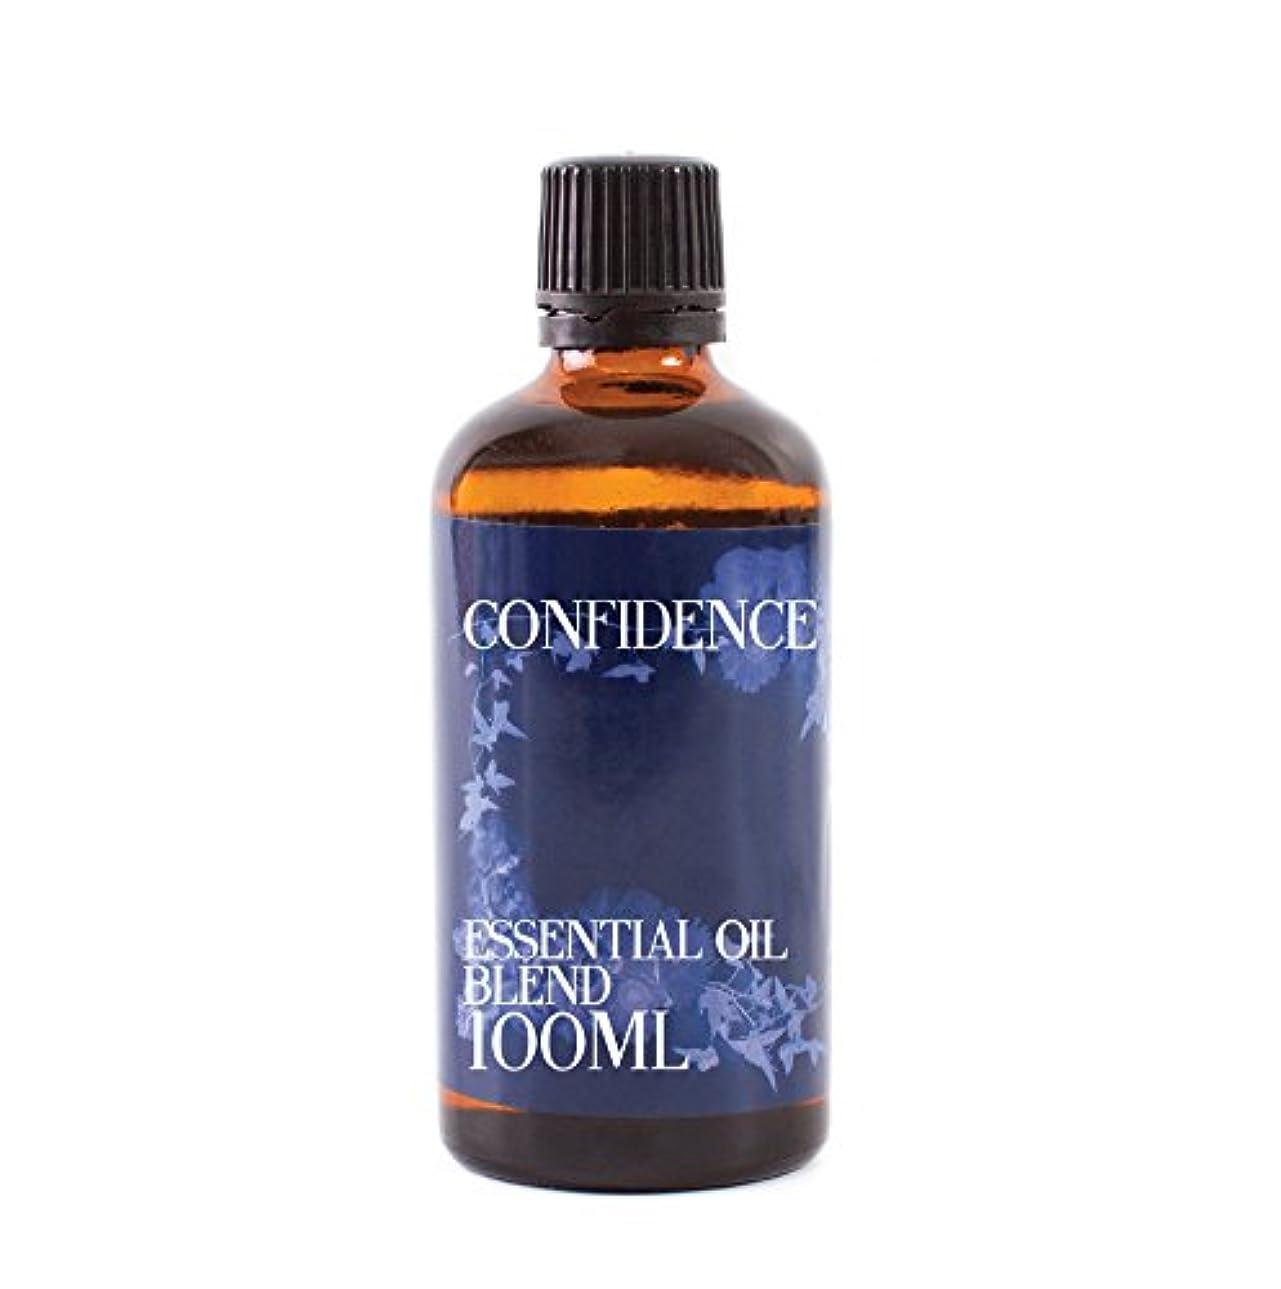 彼自身外部固有のMystic Moments | Confidence Essential Oil Blend - 100ml - 100% Pure